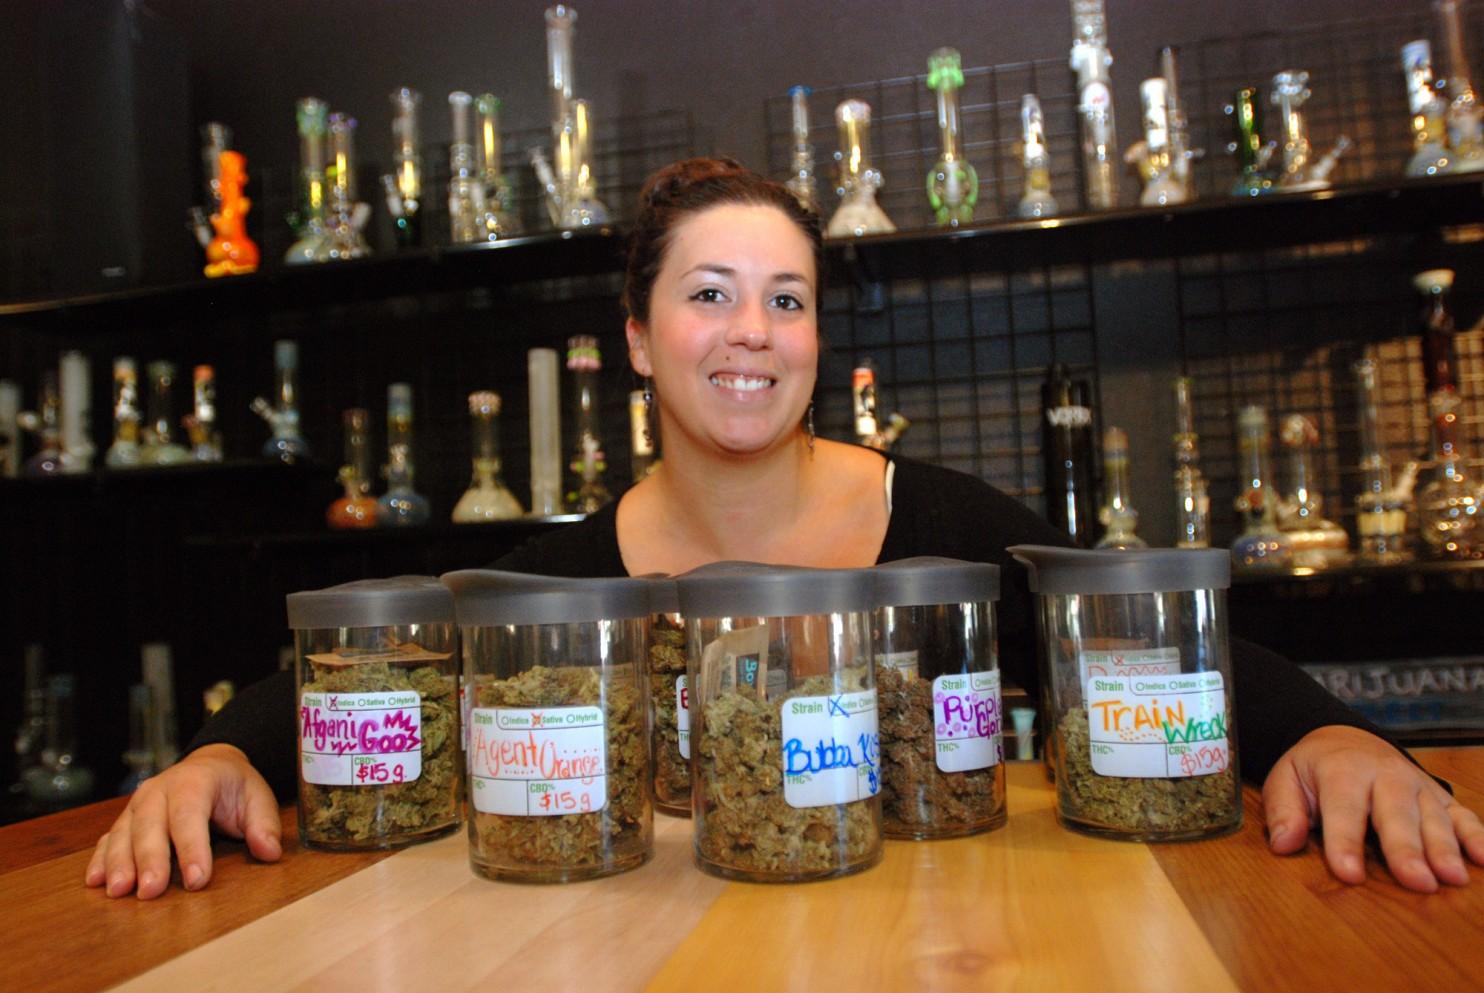 Puffs Smoke Shop in Ashland, Ore., is seeking a license as a medical marijuana dispensary. (Jeff Barnard/Associated Press)